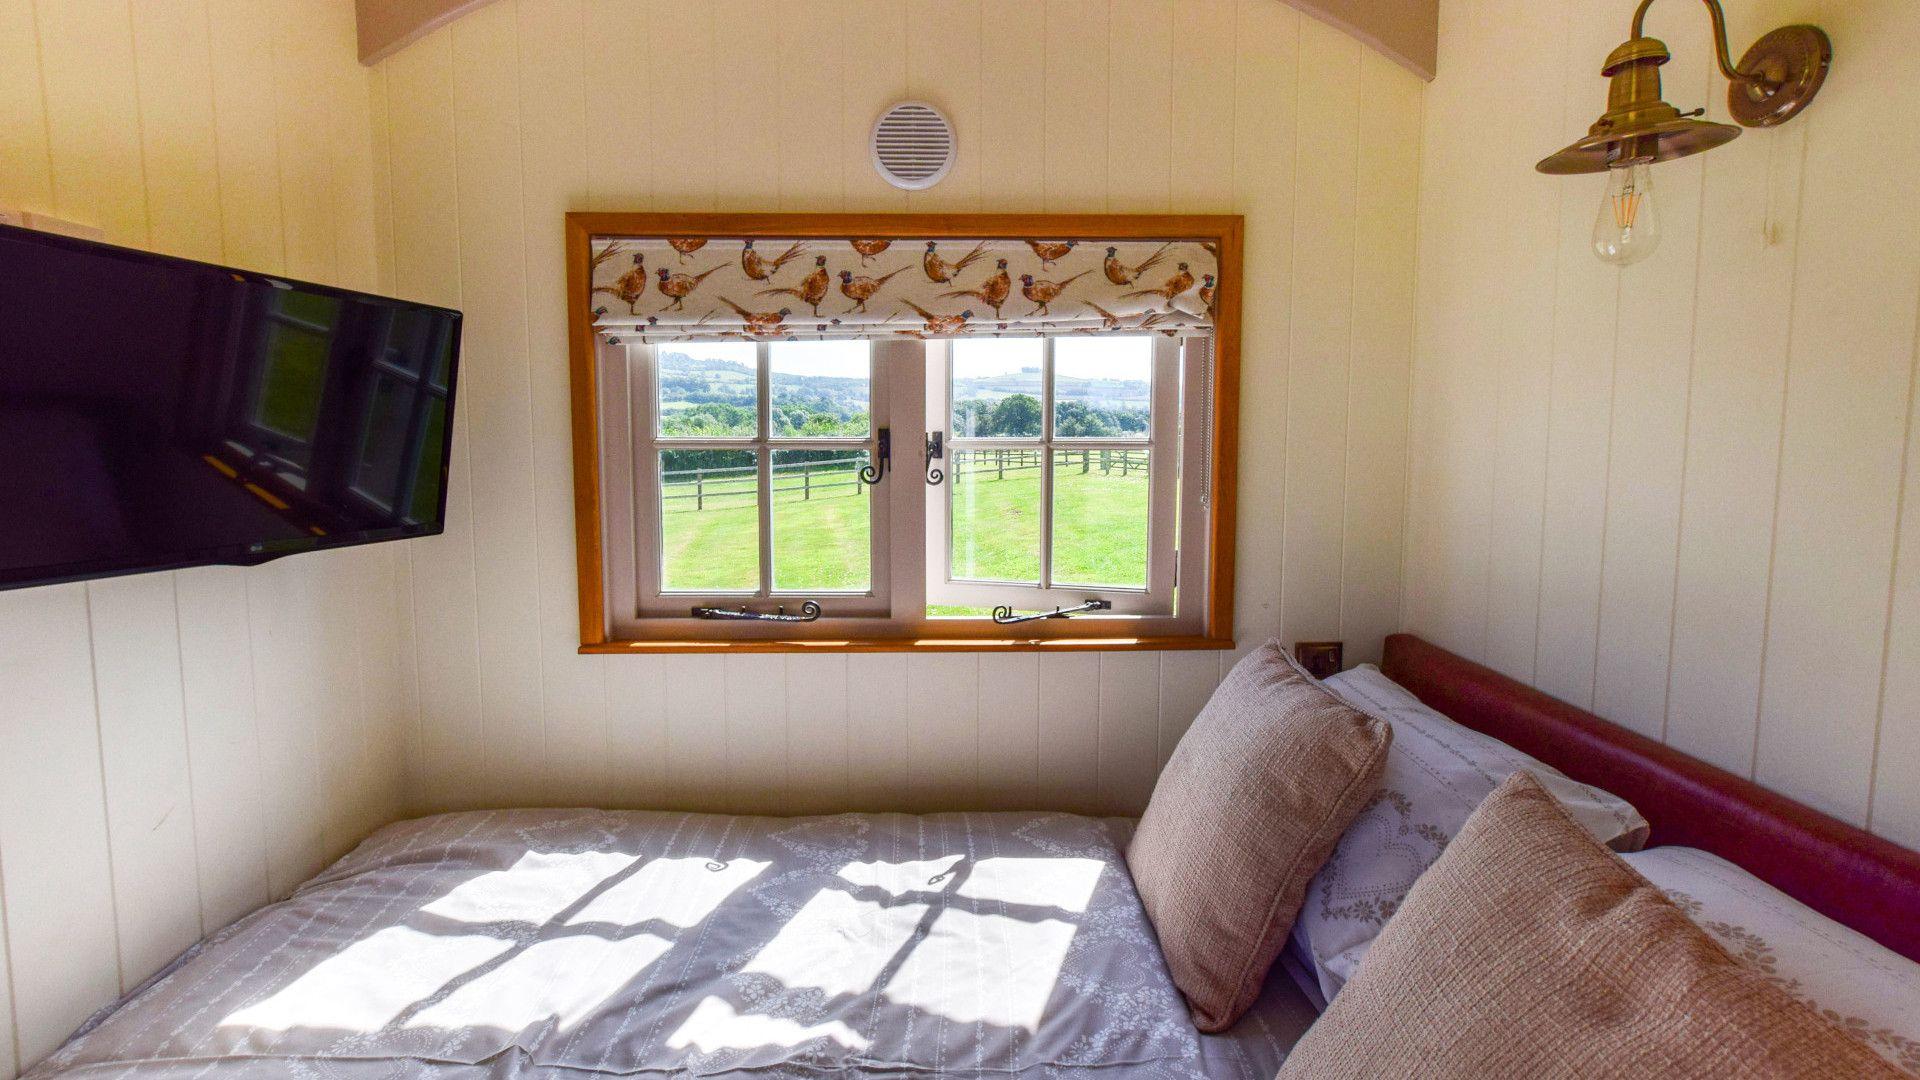 Bed and TV, Shepherds Hut at Avon Farm, Bolthole Retreats